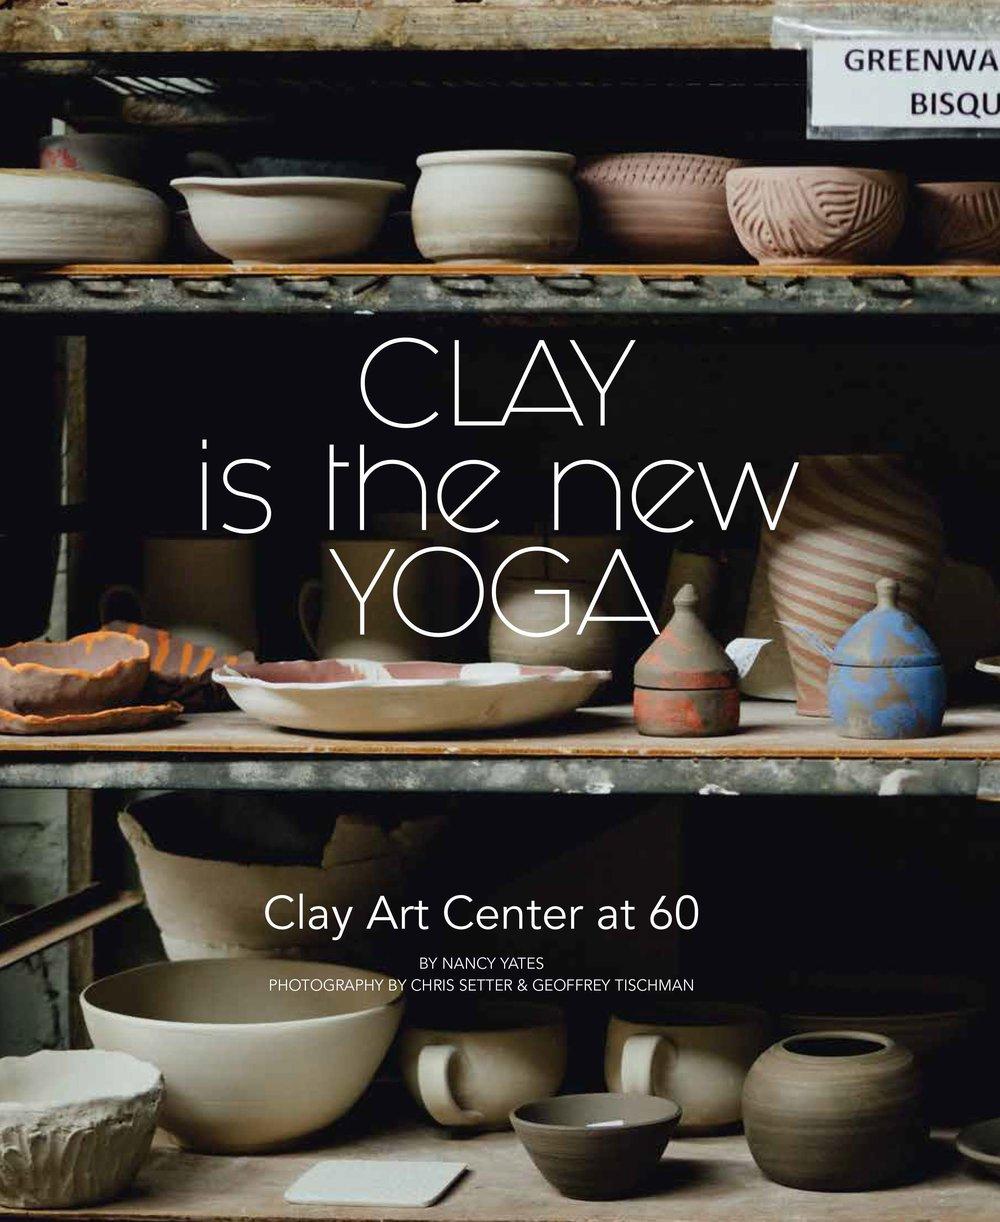 Clay Art Center Venu Magazine Feature Fall 2017-page 1.jpg